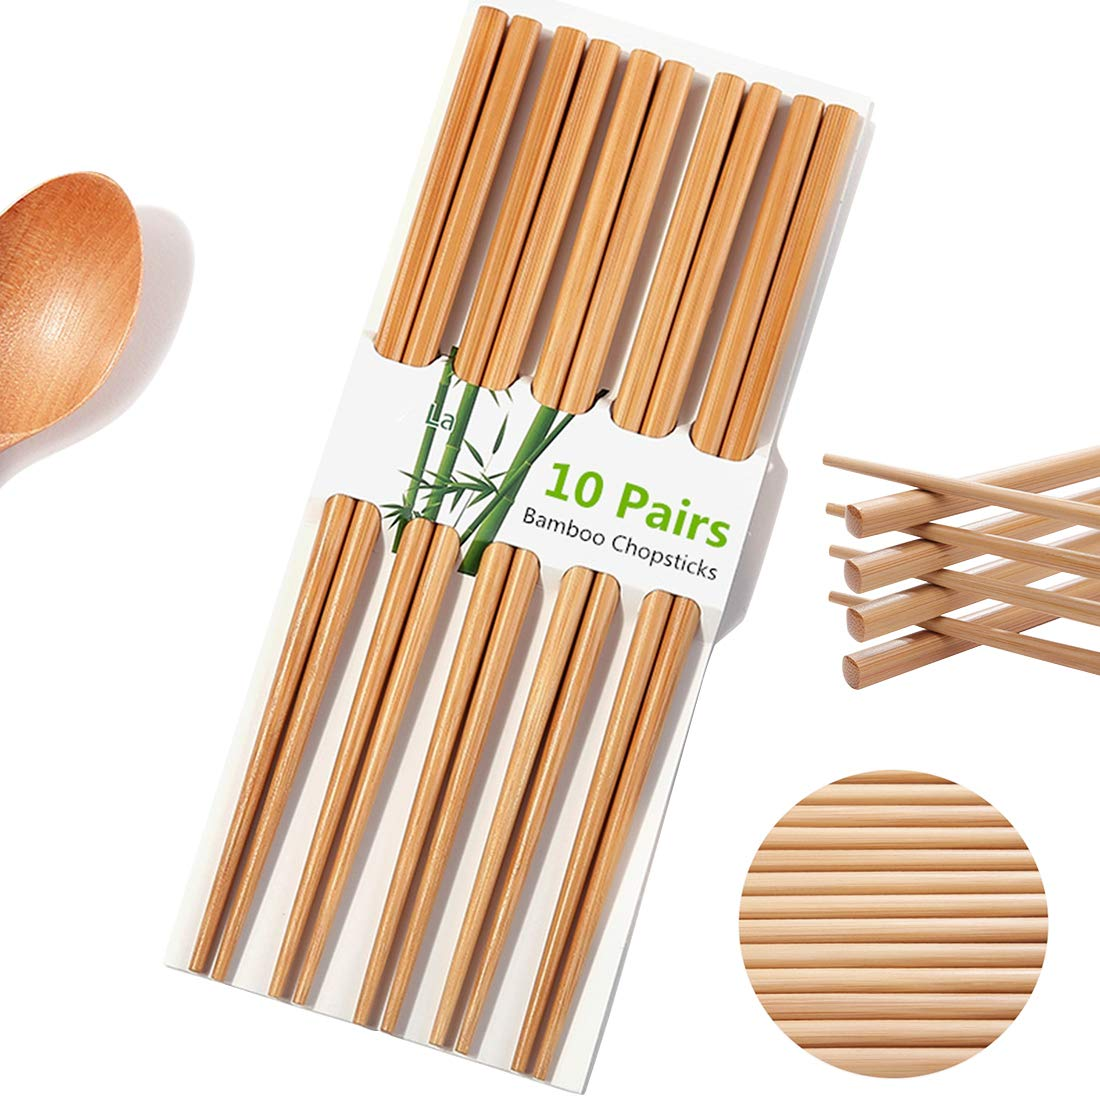 Chopsticks Chinese Natural Bamboo Chopsticks 9.4 Inch / 24cm Long Lightweight Reusable Wood Chopstick Set for Eating Cooking -10 Pairs Gift Sets Dishwasher Safe Color1【Upgraded Version】